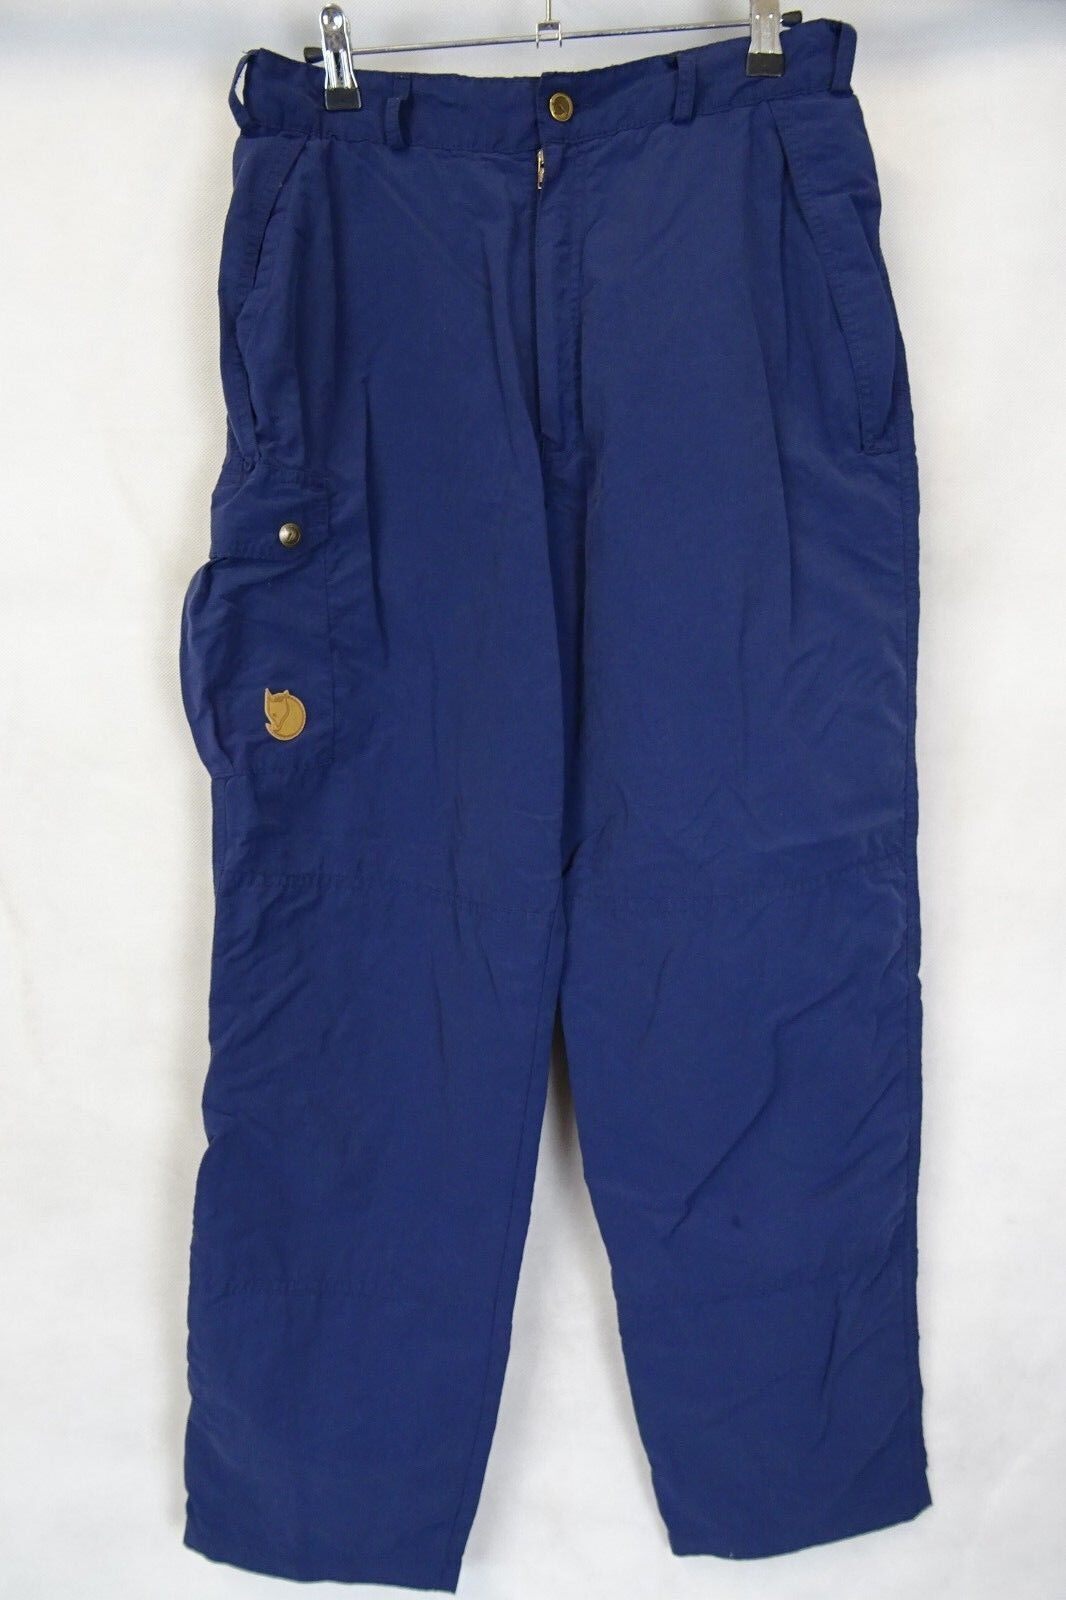 Men's Fjallraven Outdoor Trousers Hunting Combat Größe W30 L28 AA2399